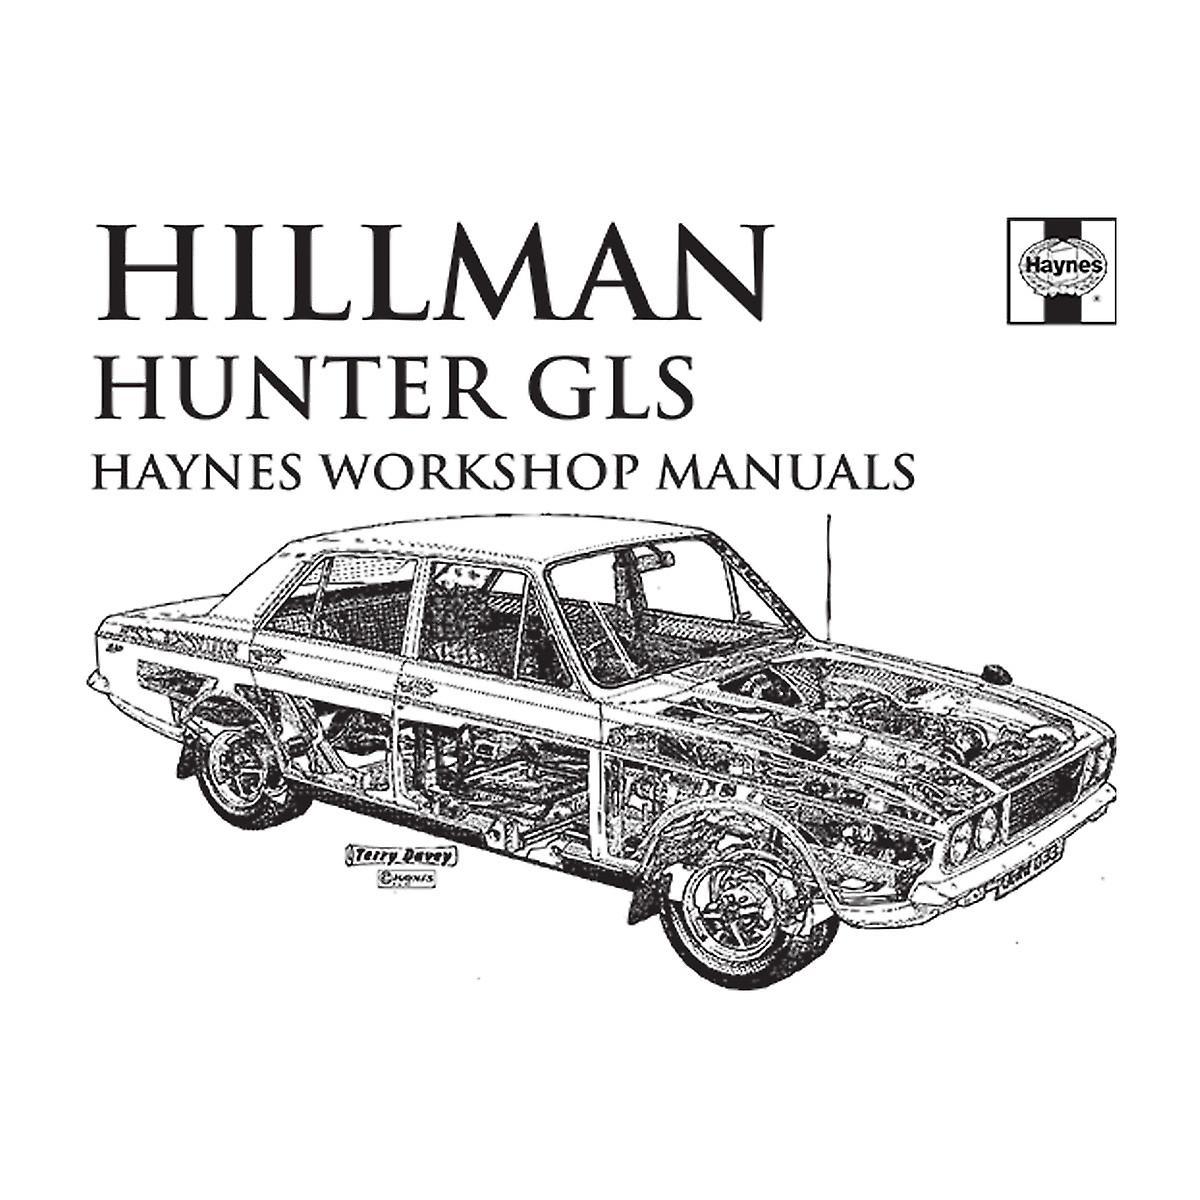 Haynes Workshop Manual 0033 Hillman Hunter GLS schwarz